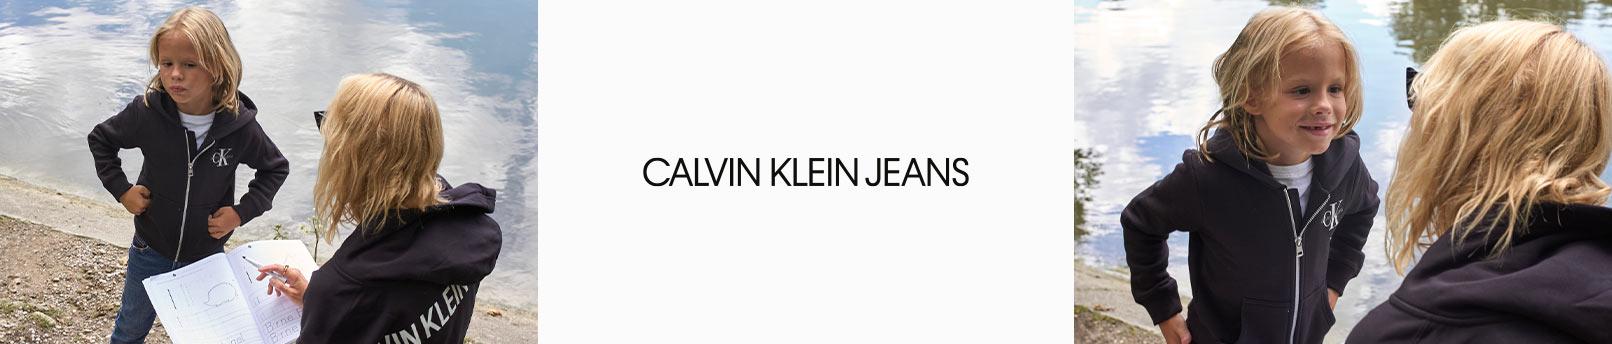 Odkryj Calvin Klein Jeans